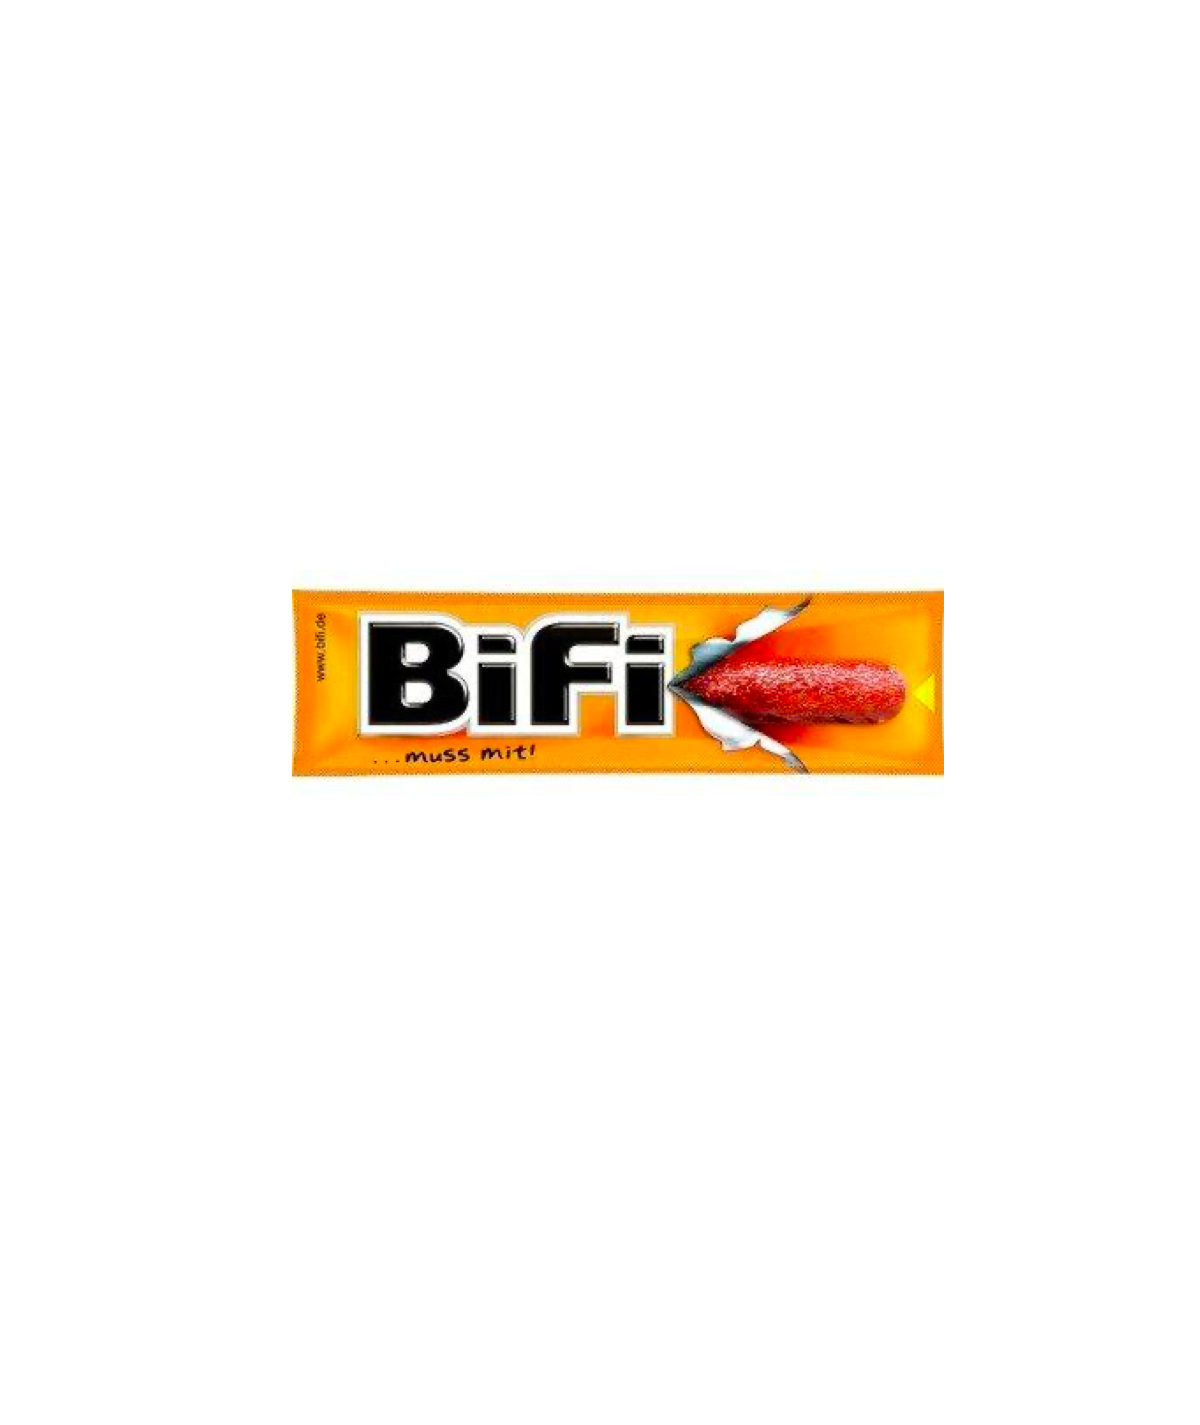 Bifi Original 20g